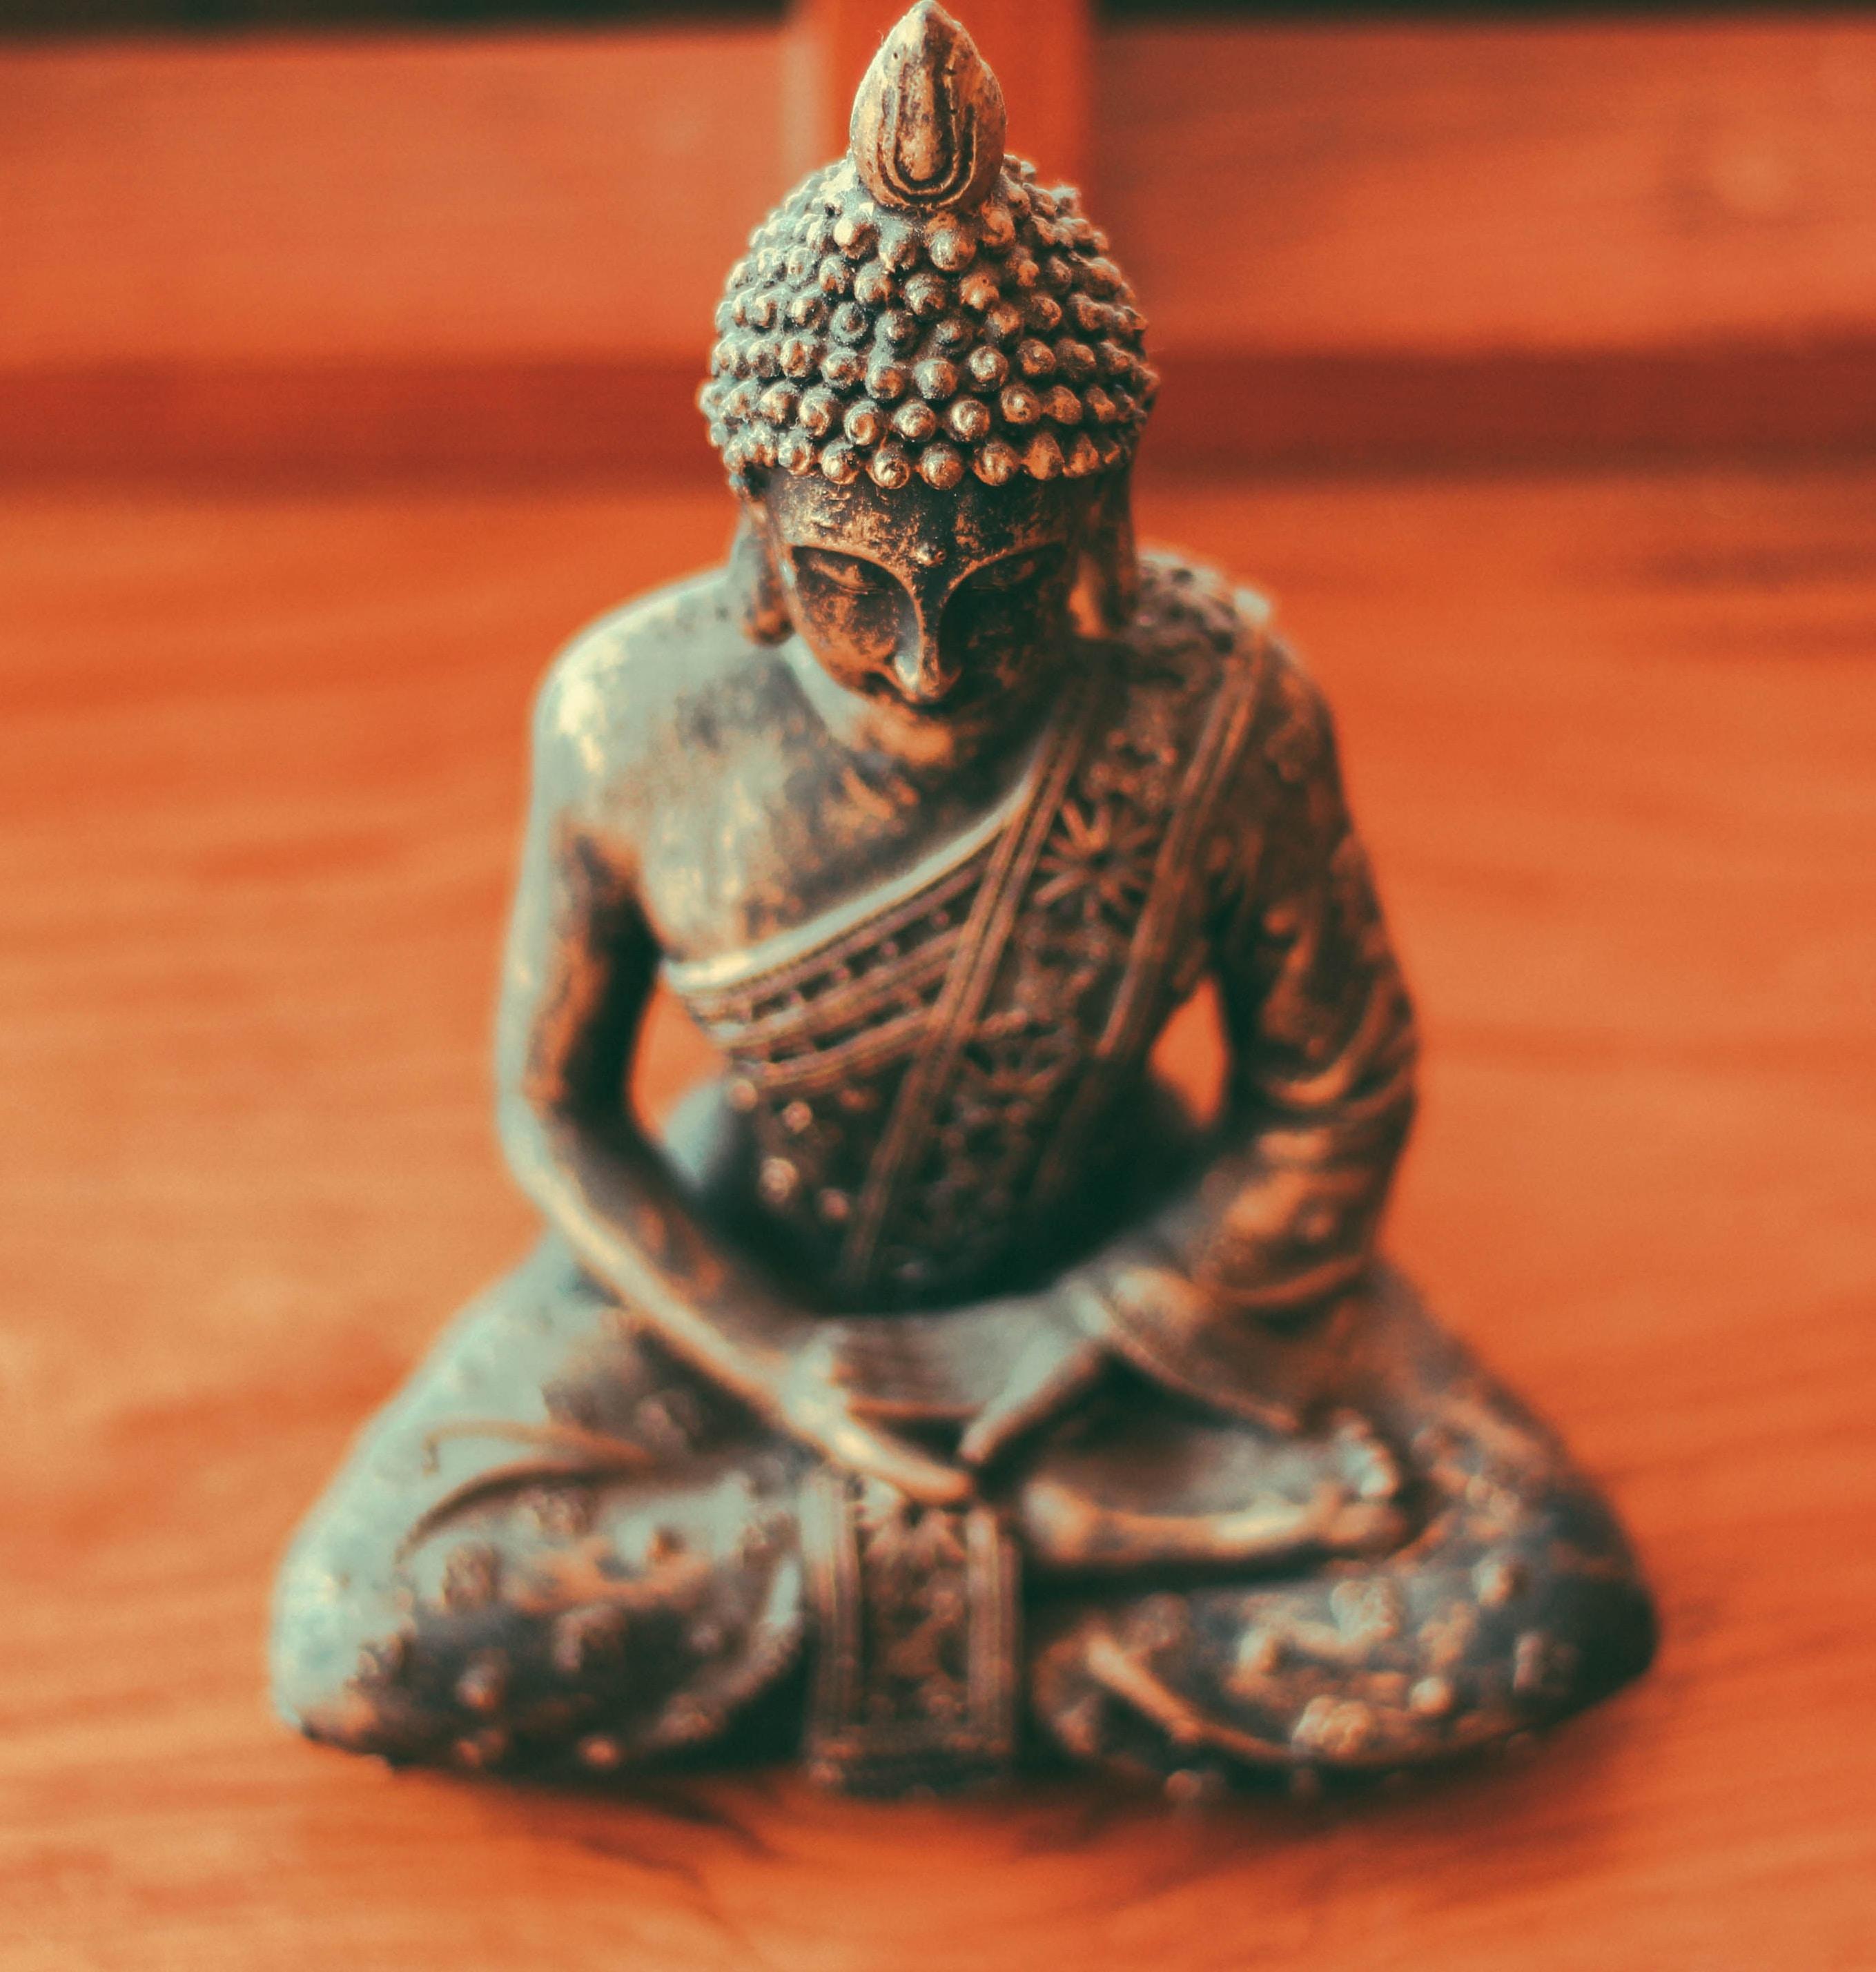 Gautama Buddha figurine on brown wooden surface